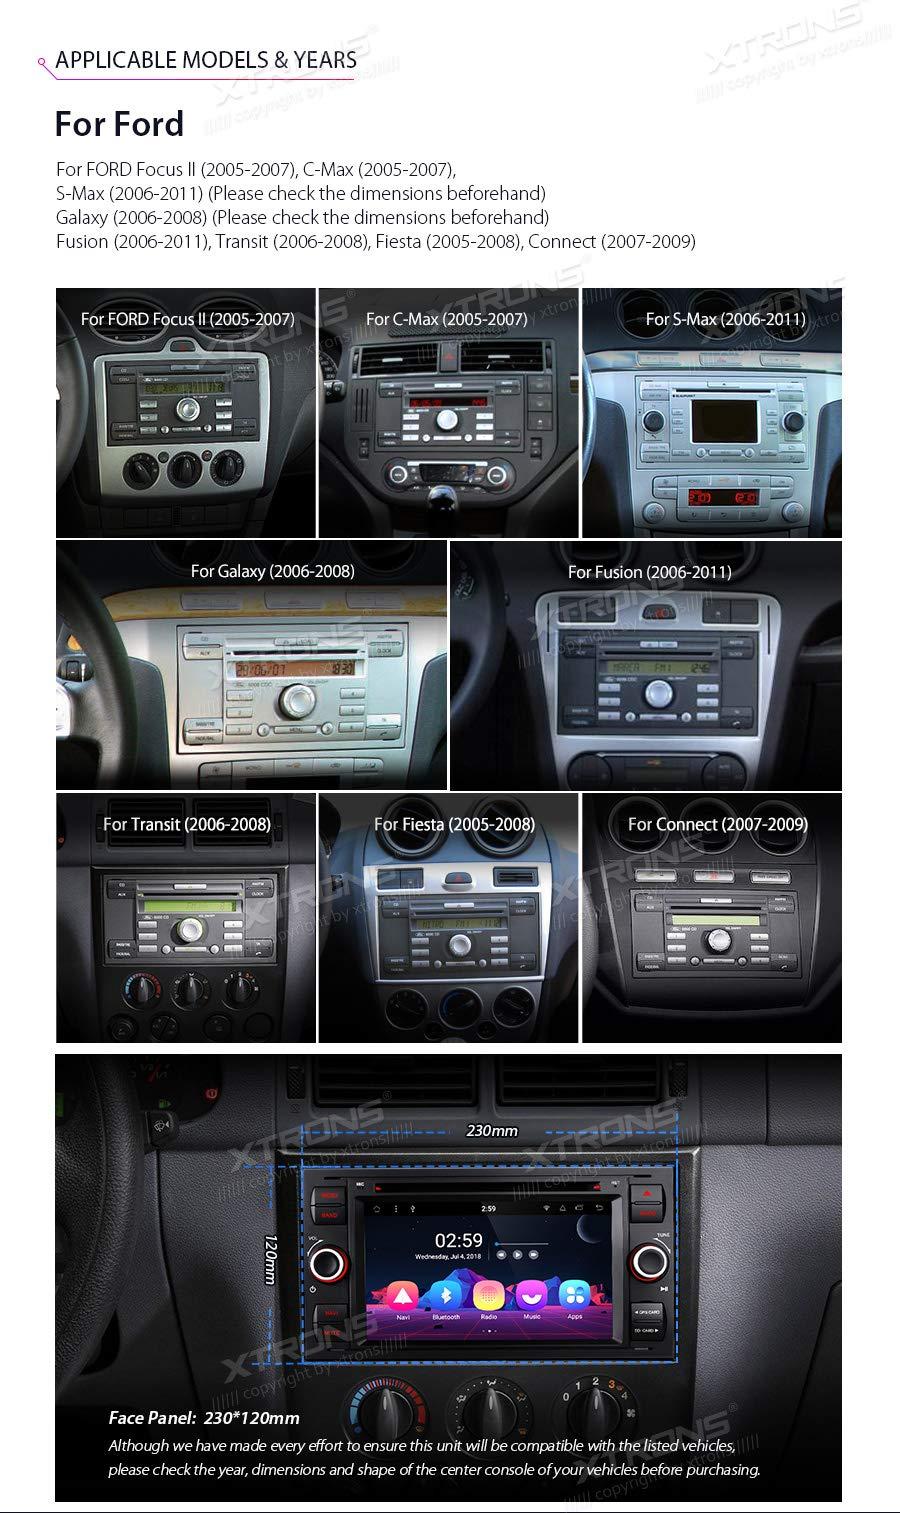 XTRONS-7-Auto-Touchscreen-Autoradio-Auto-DVD-Player-mit-Android-81-Octa-Core-Multimedia-Player-unterstzt-4K-Video-WiFi-4G-Bluetooth50-2GB-RAM-16GB-ROM-DAB-OBD2-FR-Ford